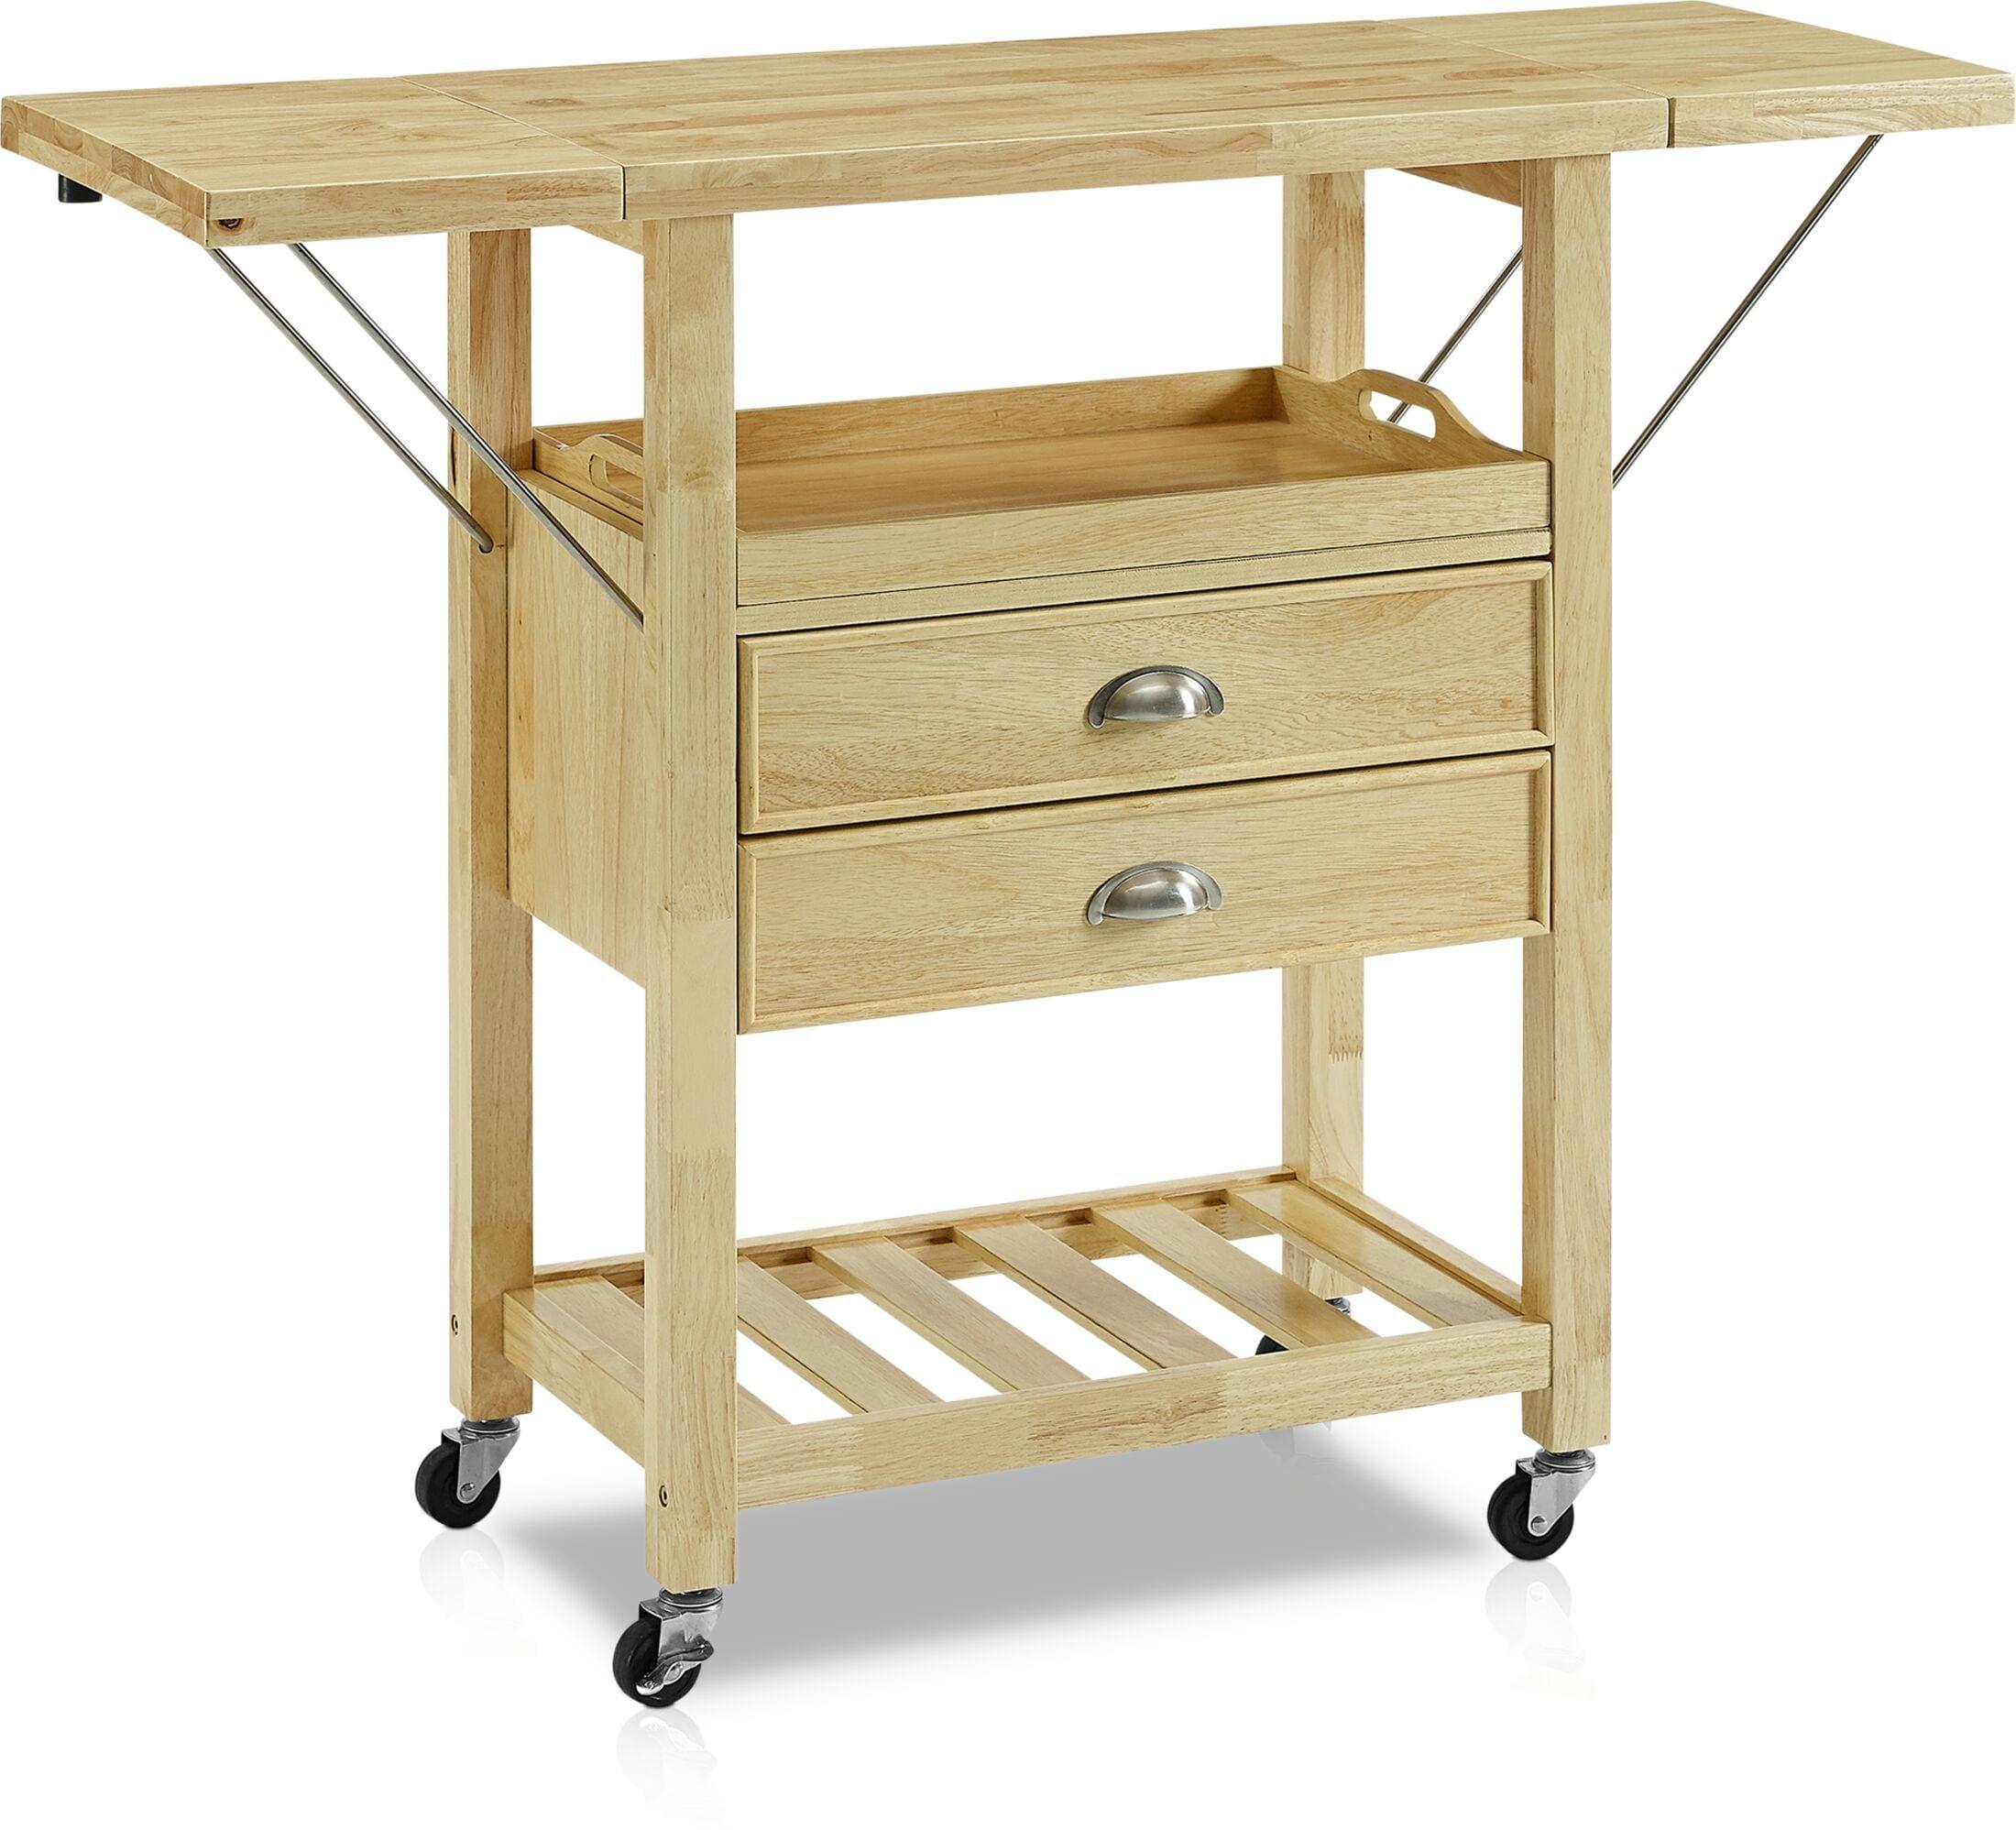 Dining Room Furniture - Nell Drop-Leaf Kitchen Cart